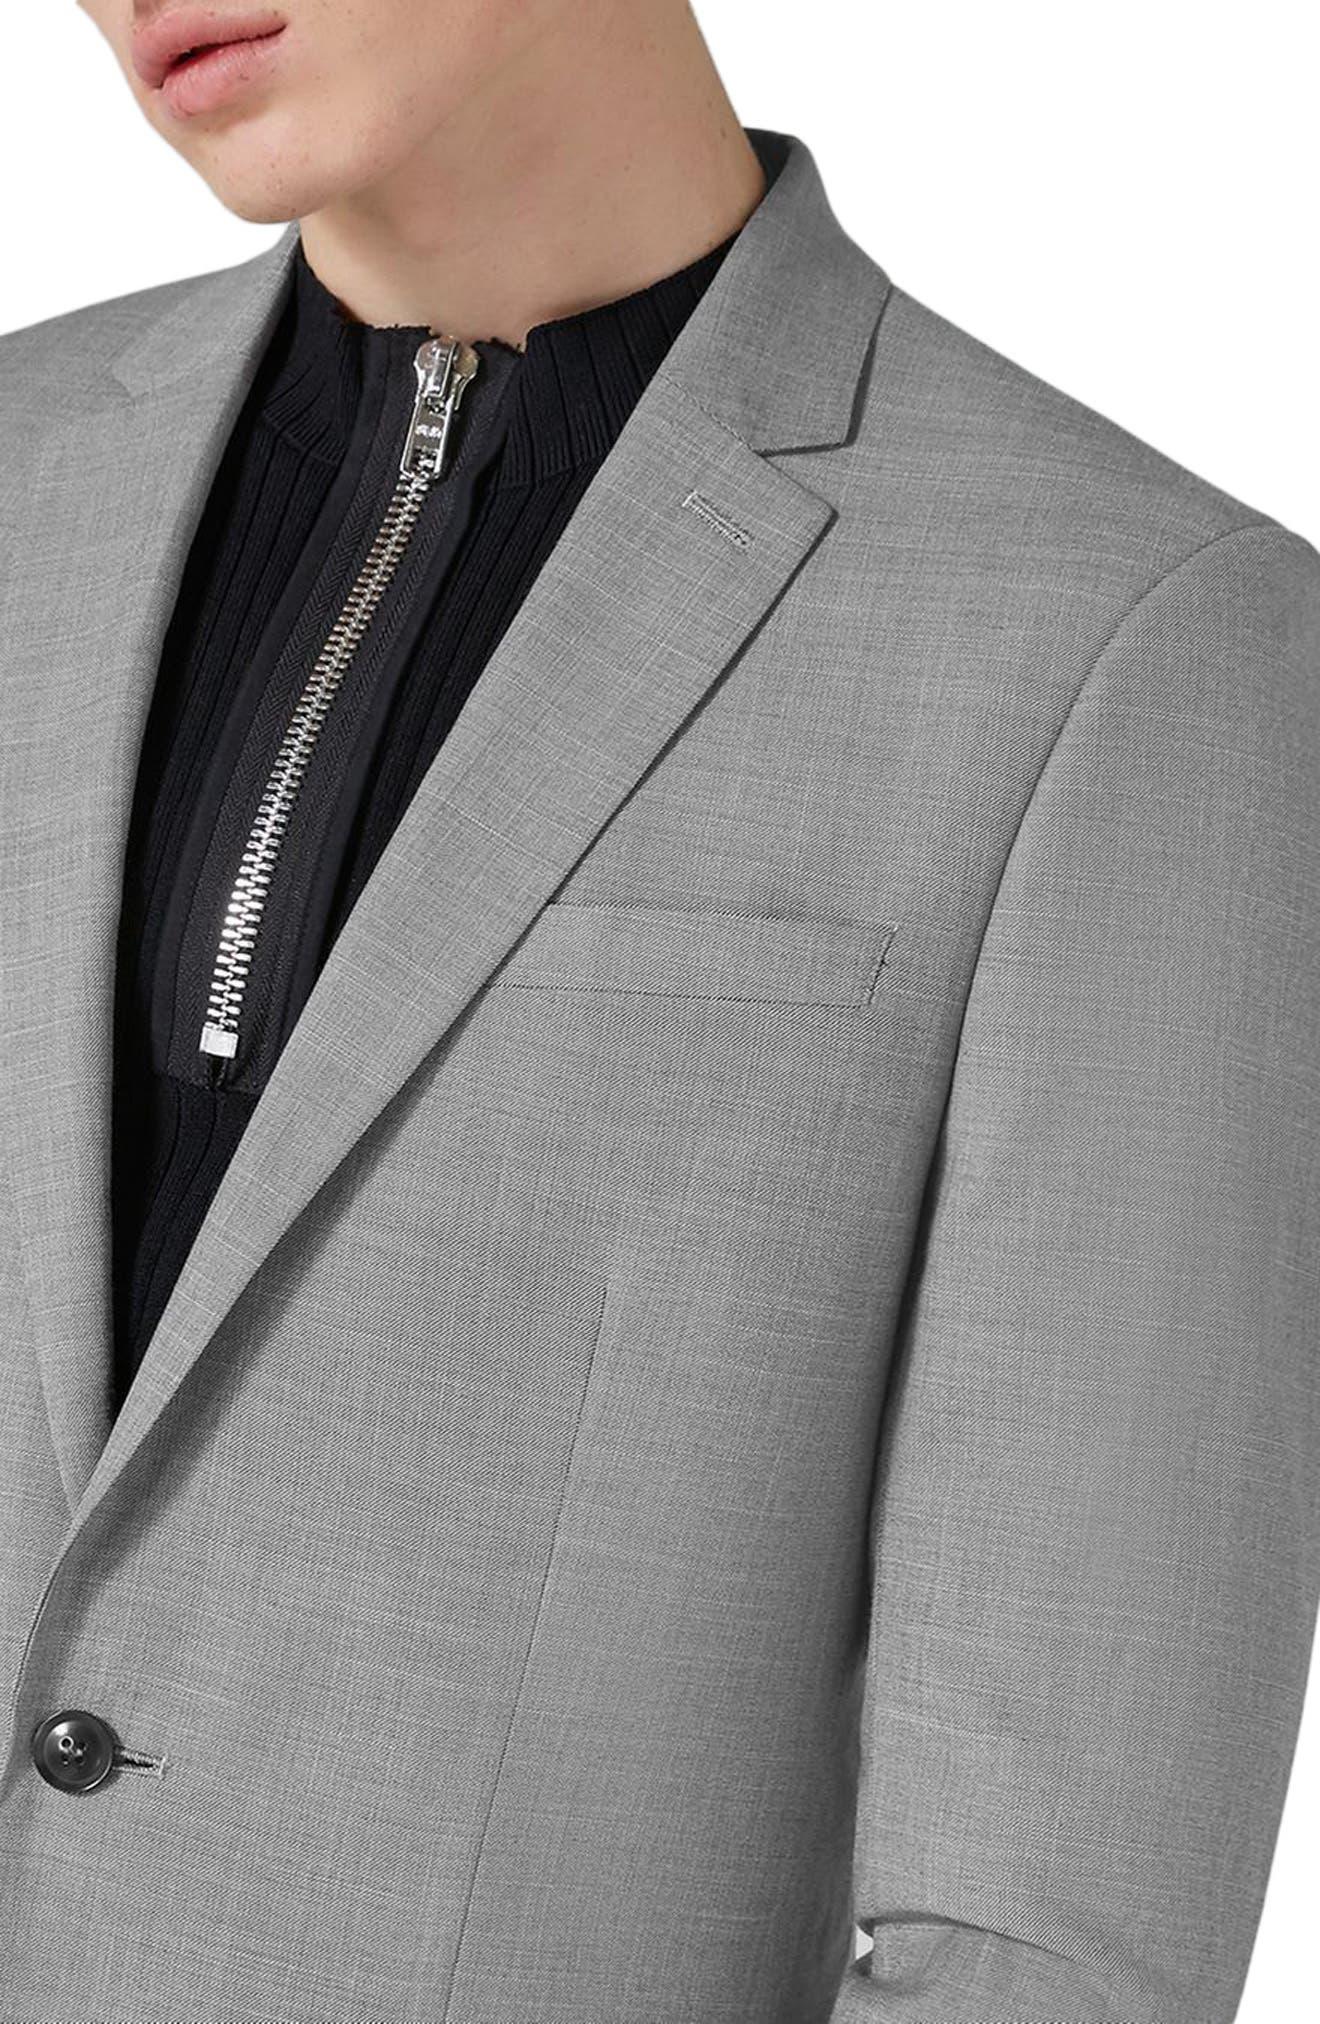 Skinny Fit Suit Jacket,                             Alternate thumbnail 3, color,                             GREY